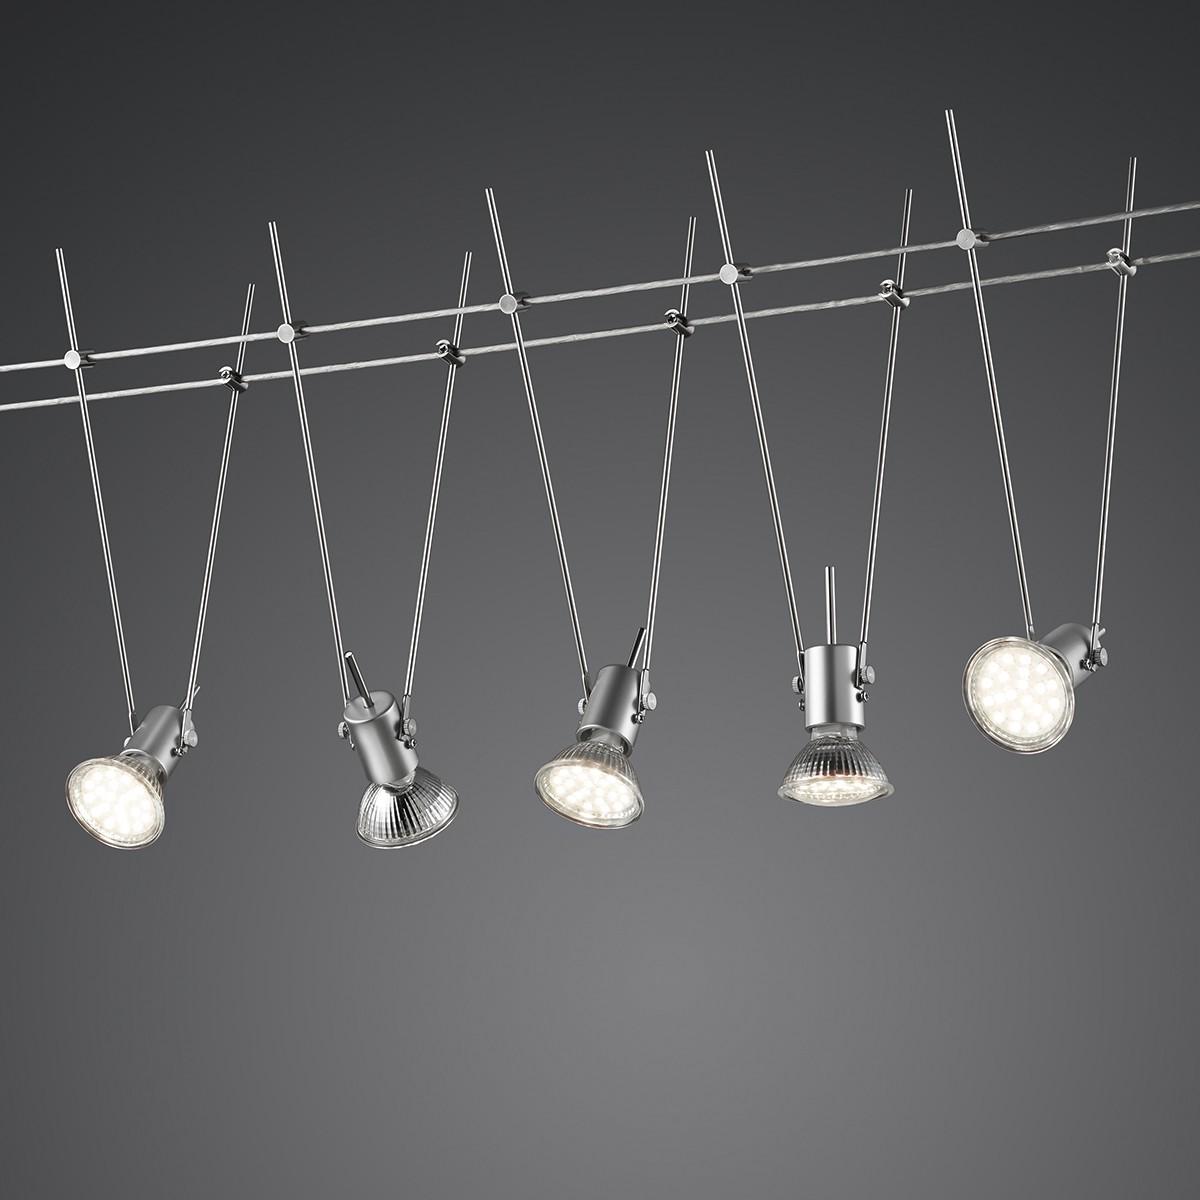 home24 LED-Deckenleuchte Basic